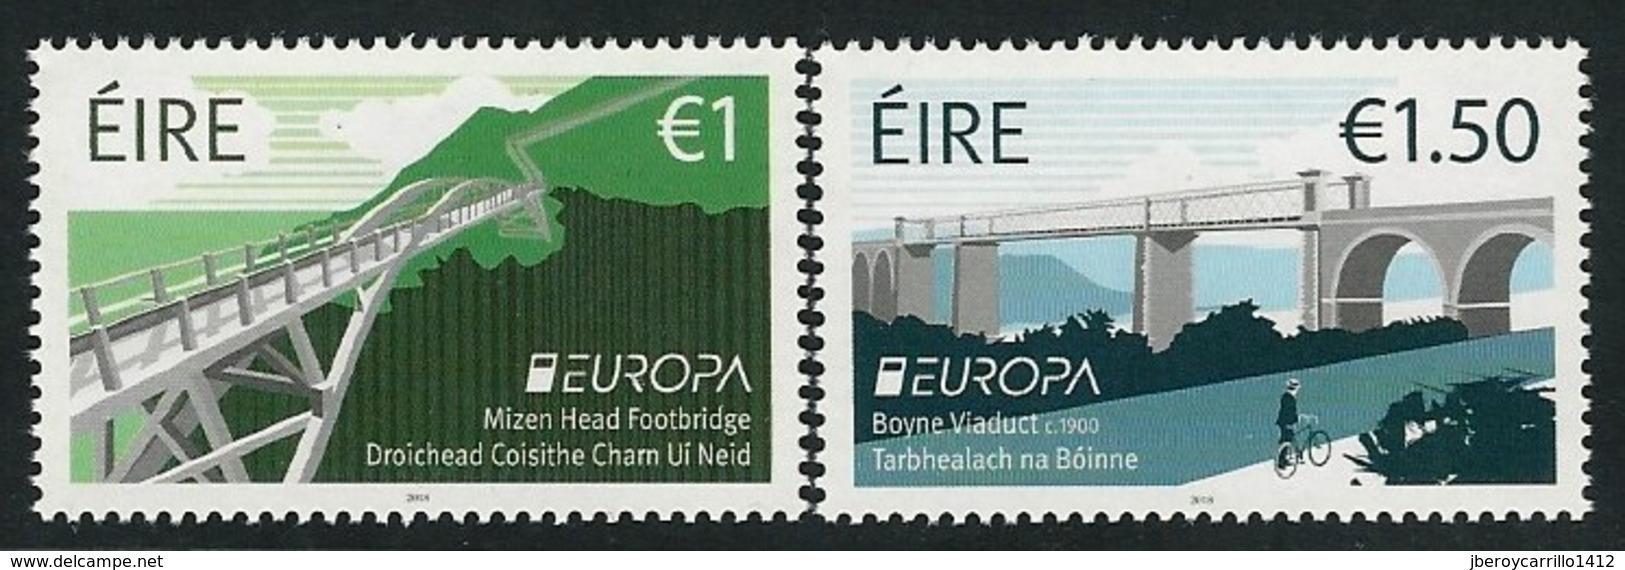 "IRLANDA/ IRELAND/ EIRE/ IRLAND -EUROPA 2018 - PUENTES.- BRIDGES - BRÜCKEN - PONTS"".-SERIE De 2 V. - 2018"